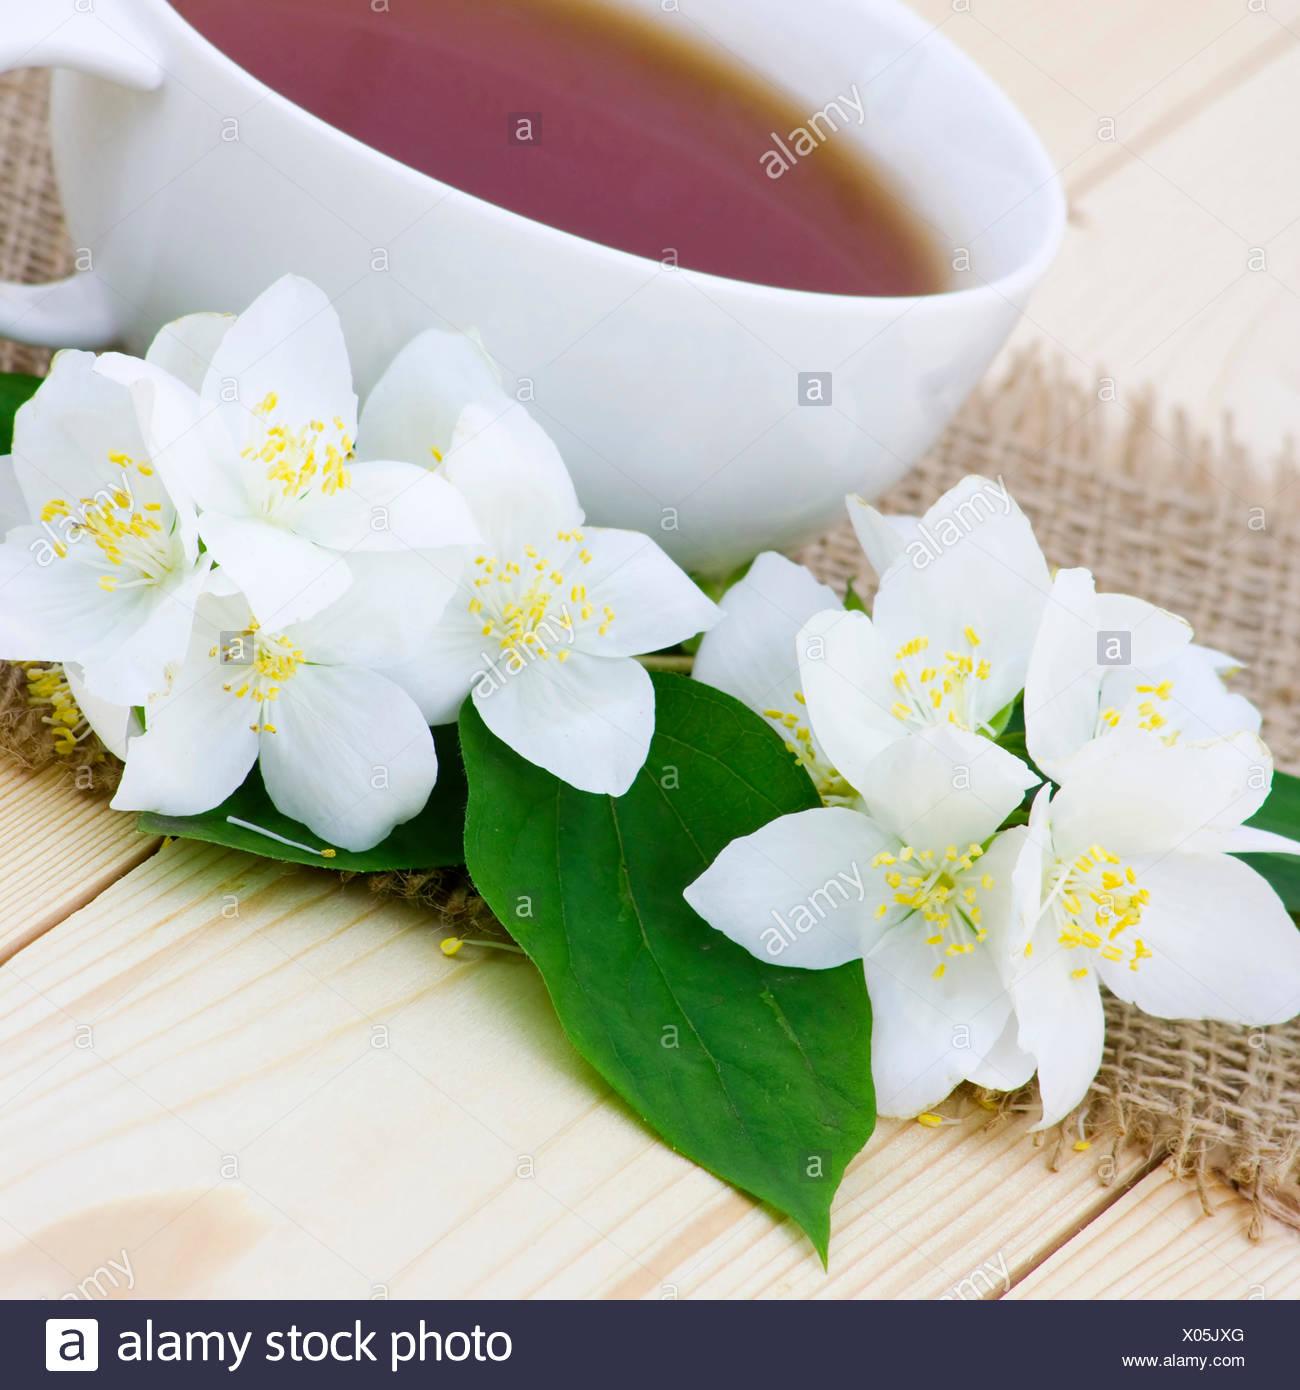 Cup Of Jasmine Tea And Jasmine Flowers Stock Photo 275490504 Alamy